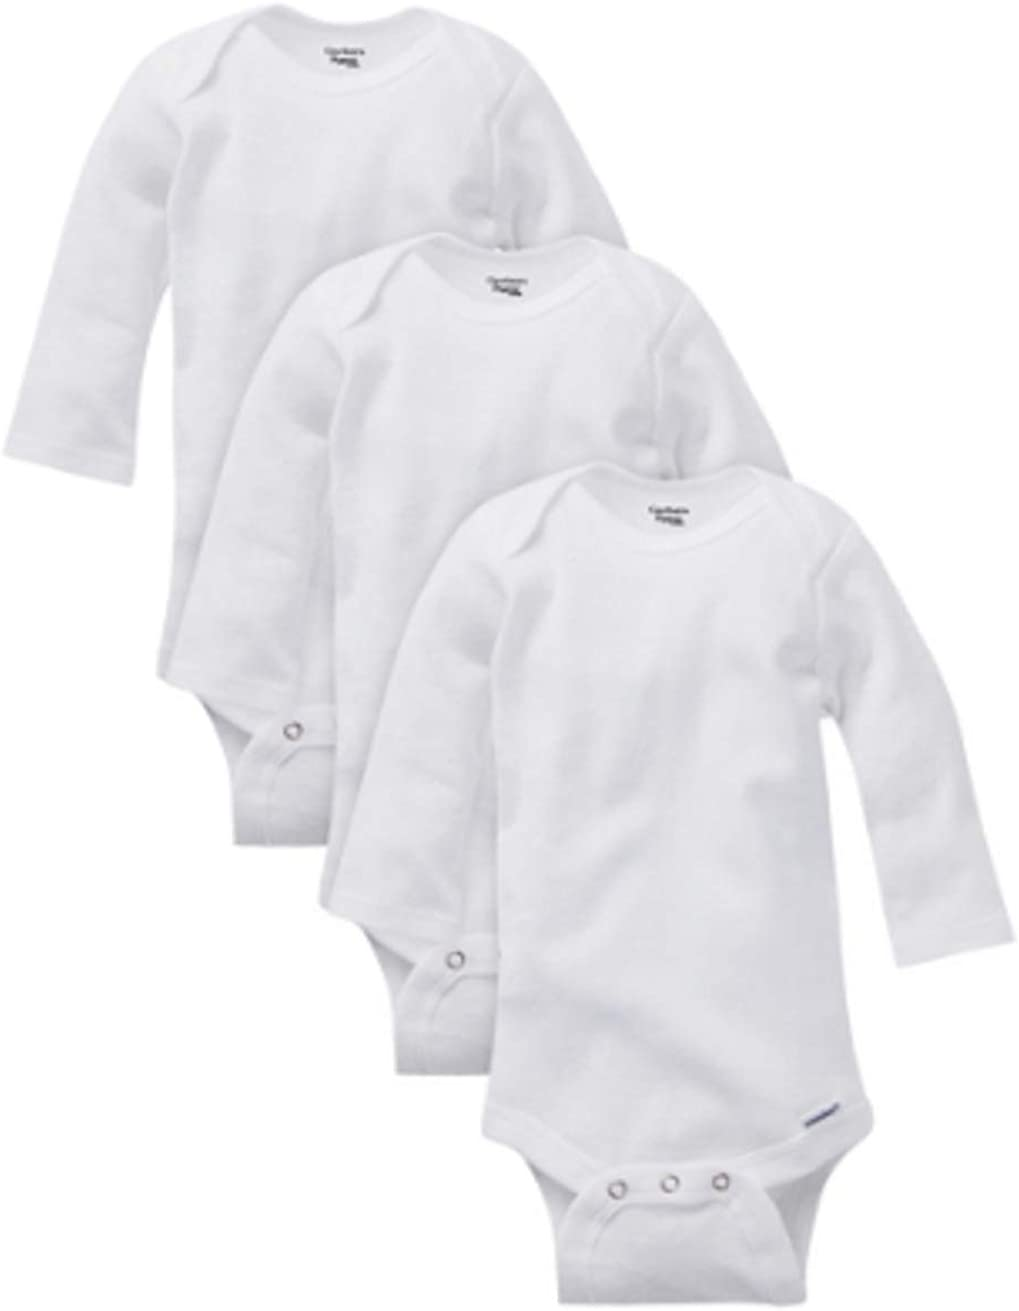 Gerber Unisex 3 Pack White Organic Long Sleeve Onesies Various Sizes Bodysuits